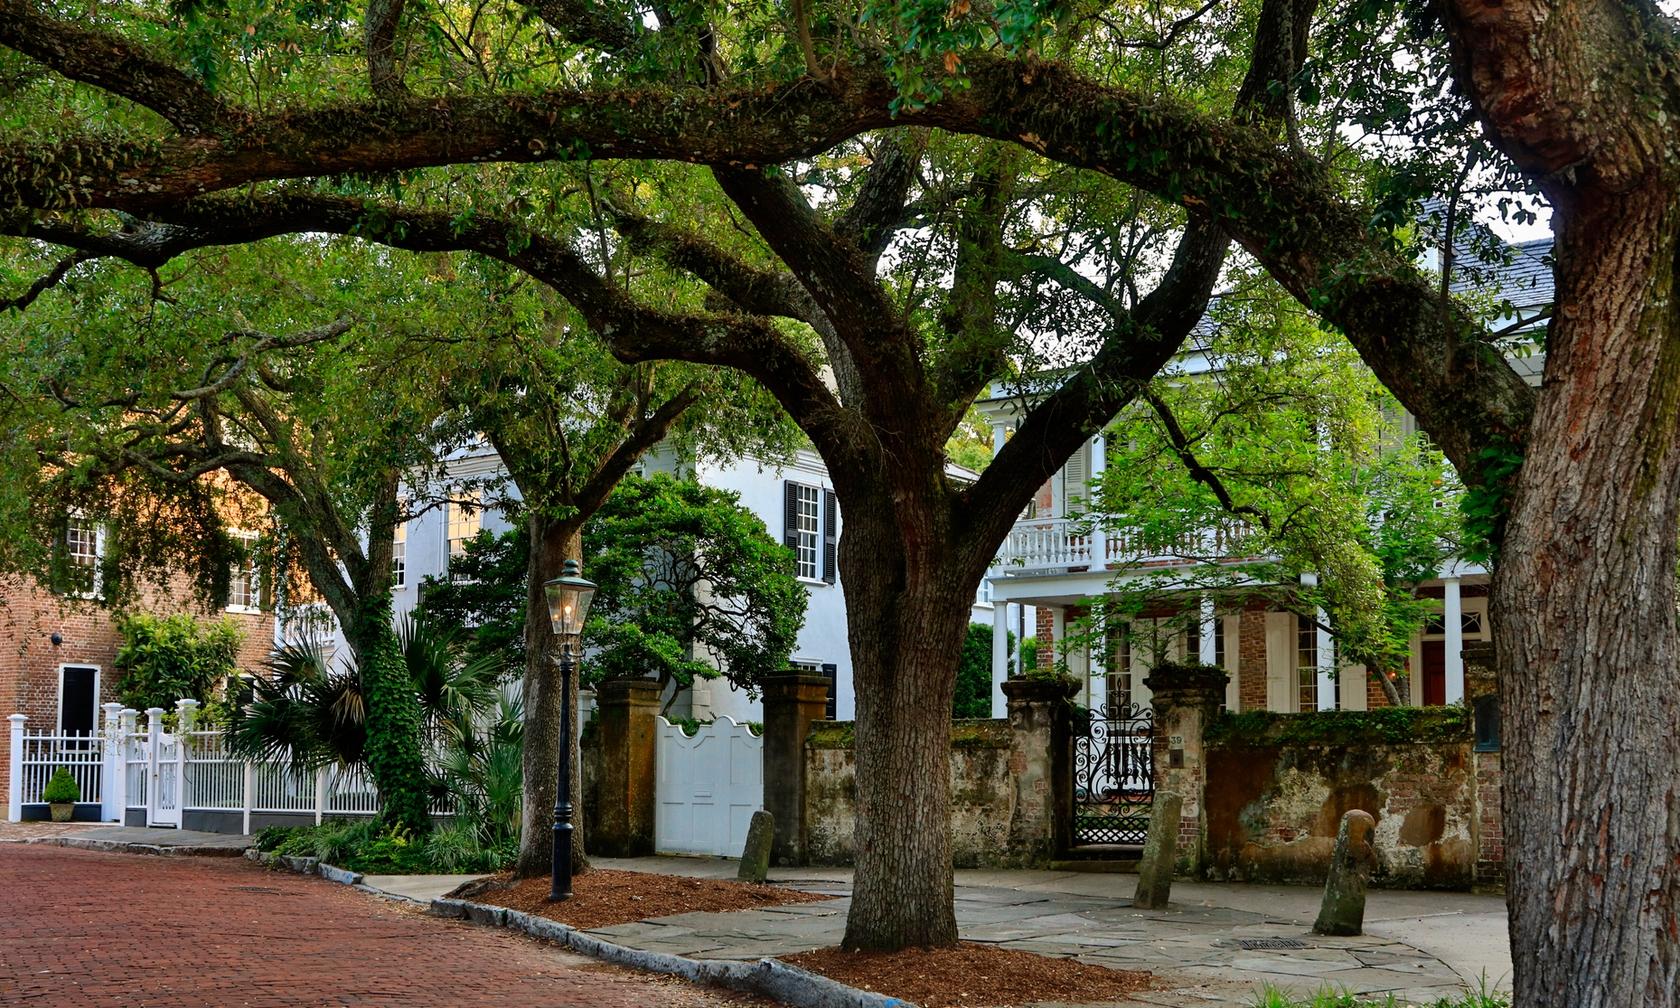 Vacation rental apartments in Charleston